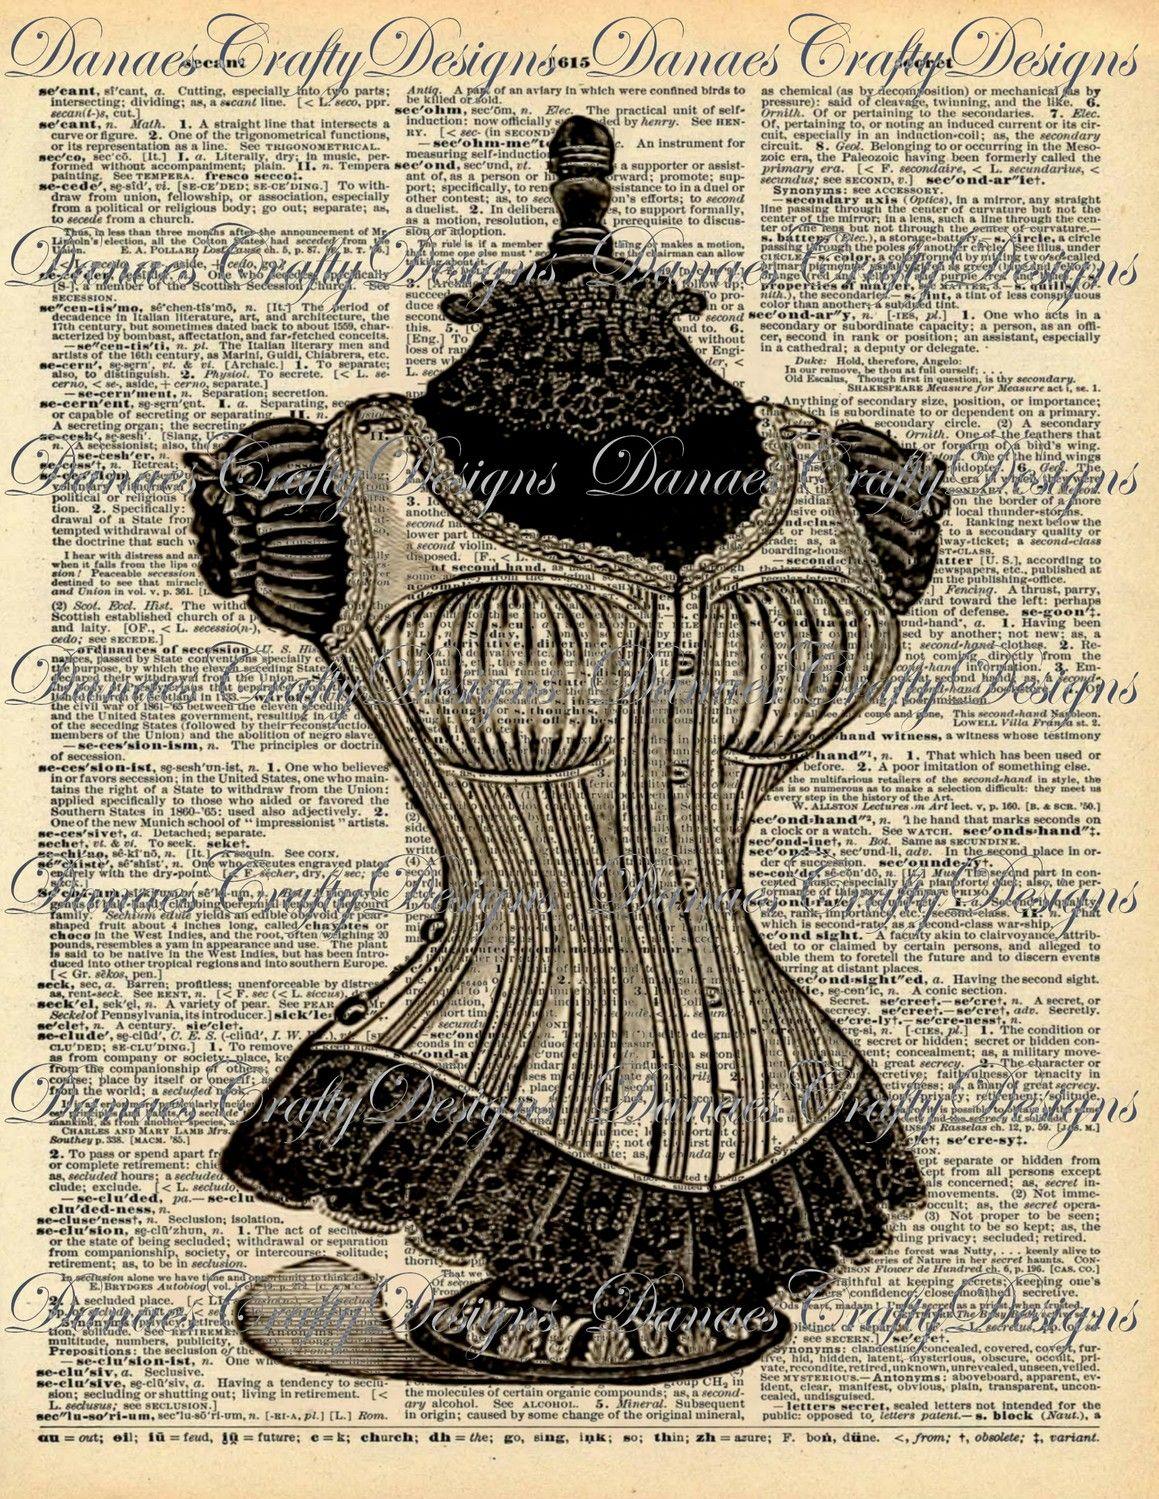 vintage corset images pinterest transfert impression sur tissu et id es de cartes. Black Bedroom Furniture Sets. Home Design Ideas